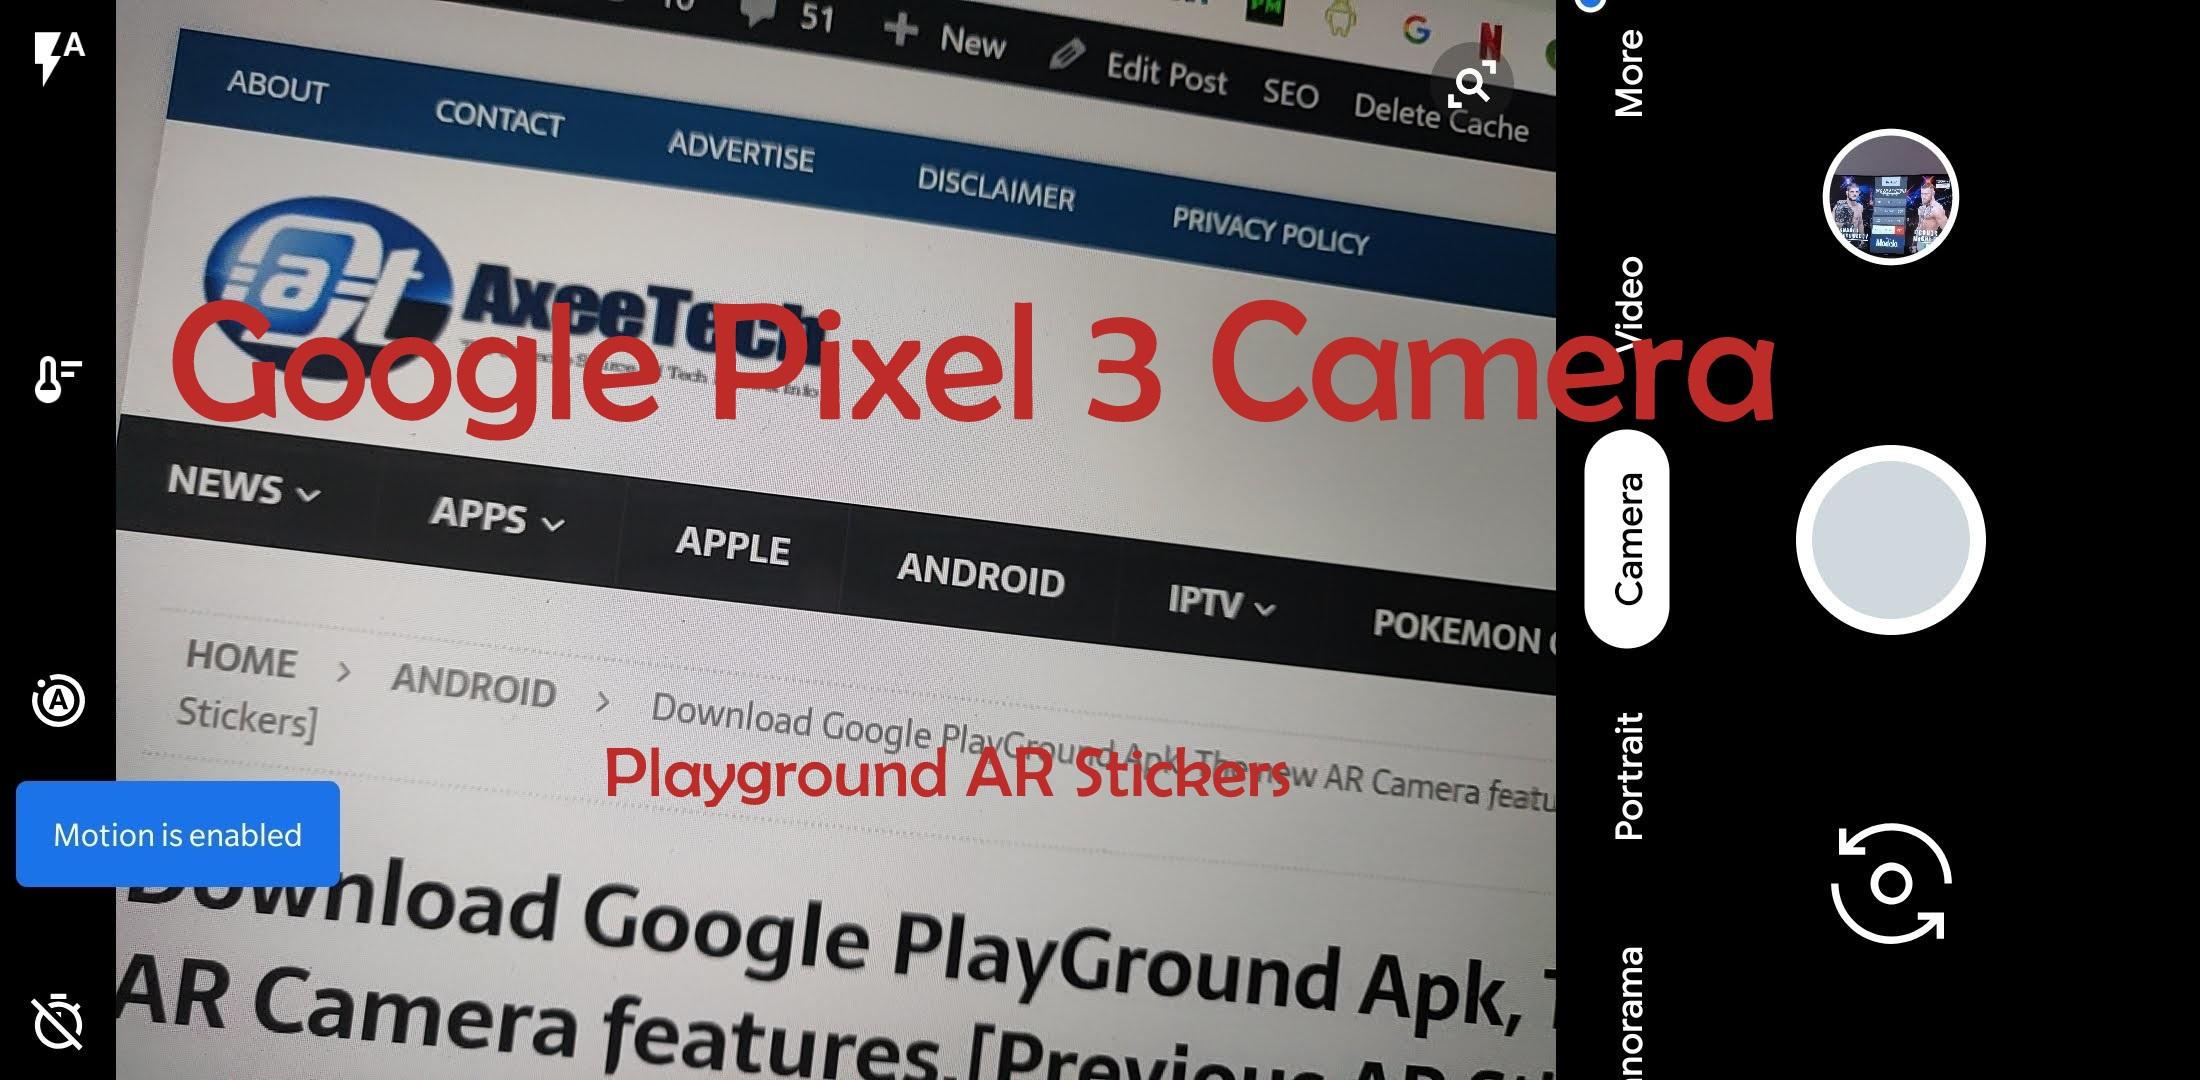 Google-Camera-Mod-Apk-6.1-PlayGround-Stickers